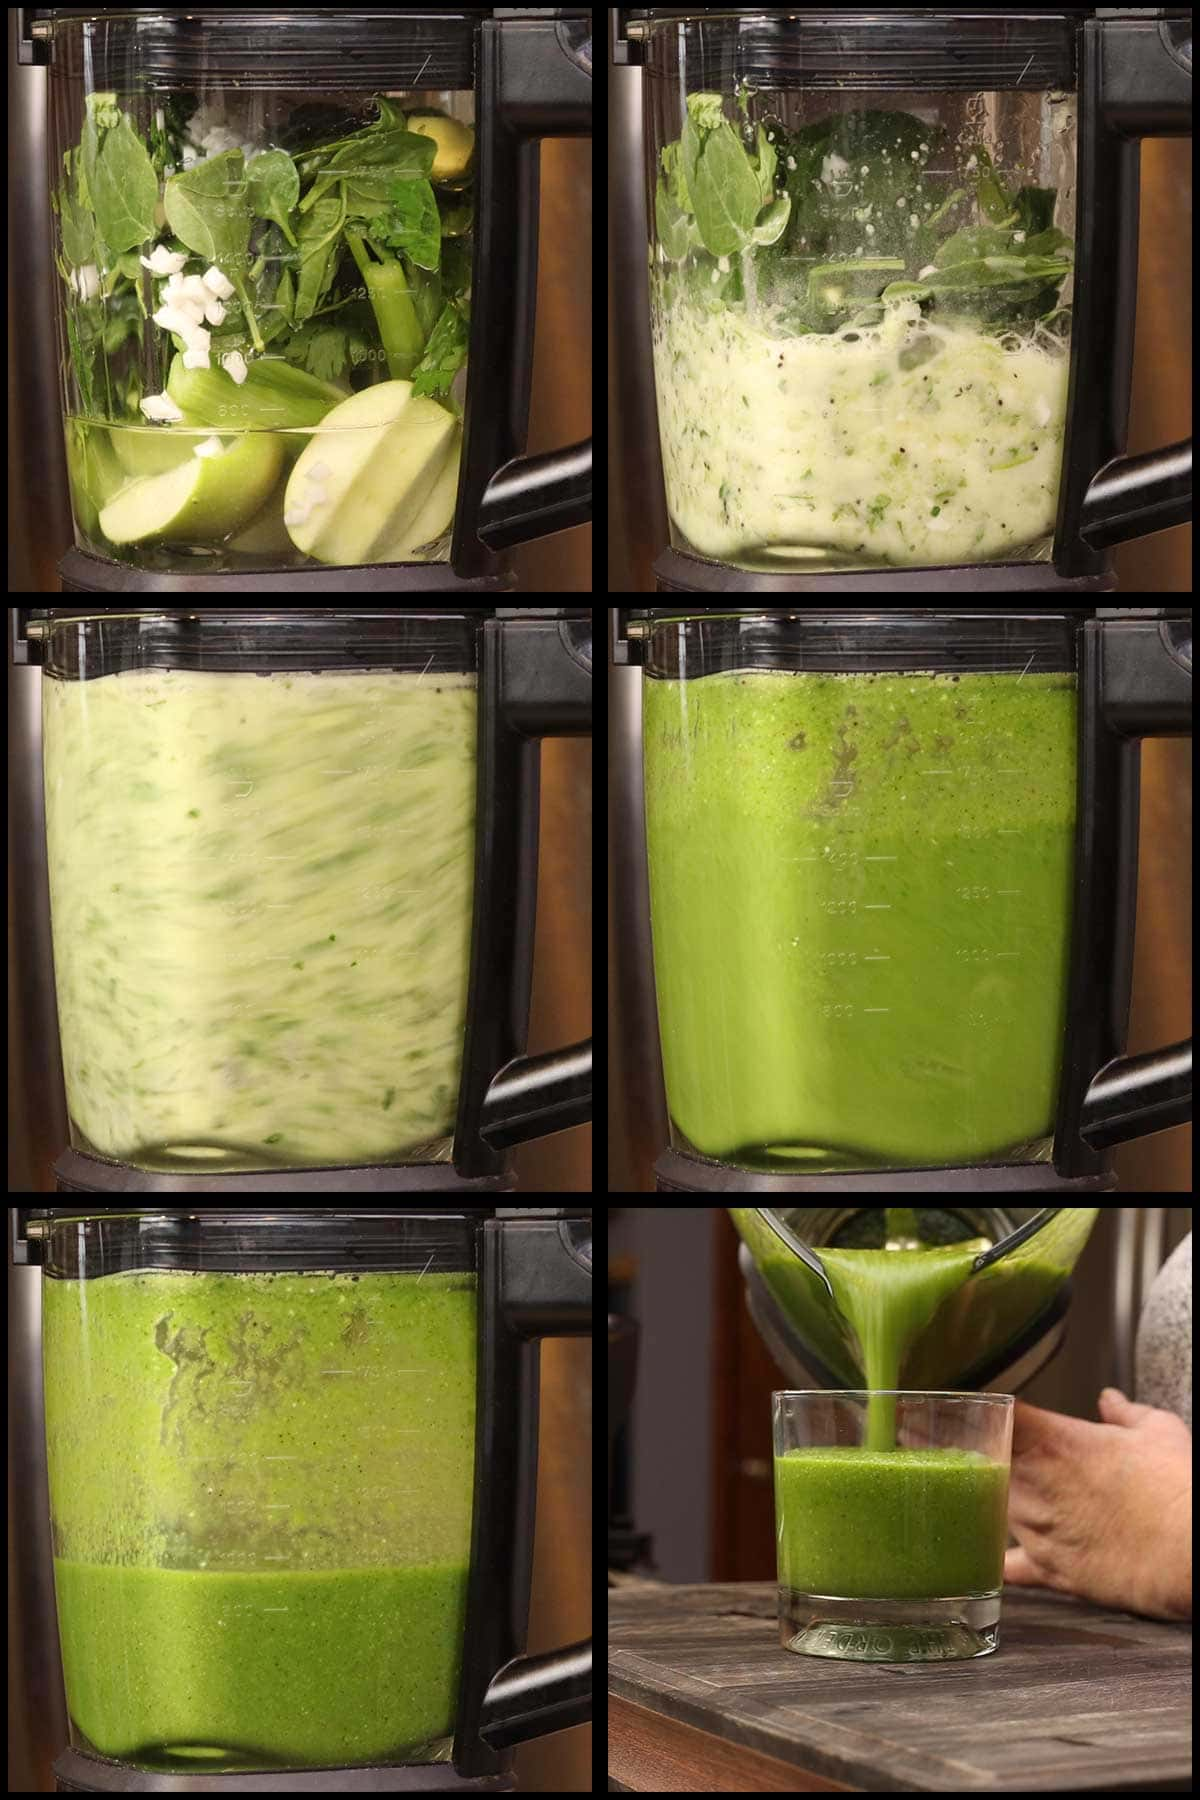 Blending green juice in the Ninja Foodi Cold & Hot Blender